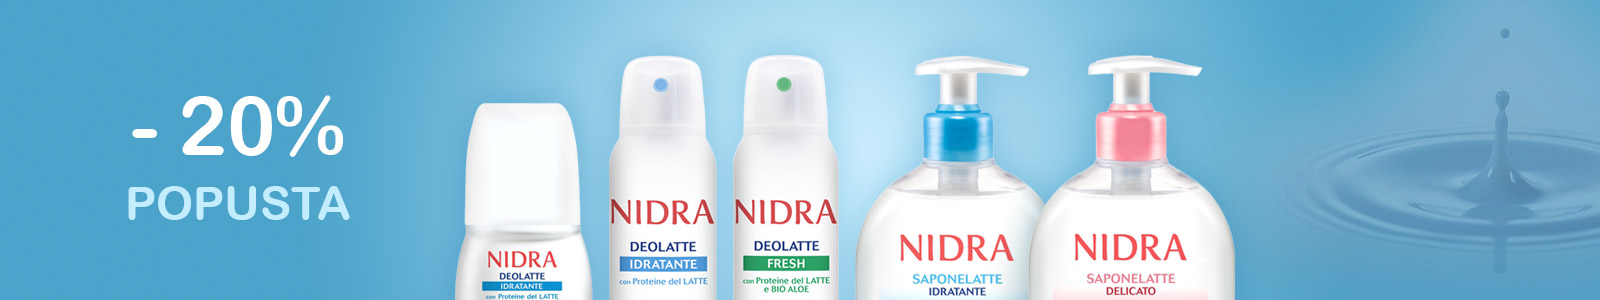 dezodoransi baner 1